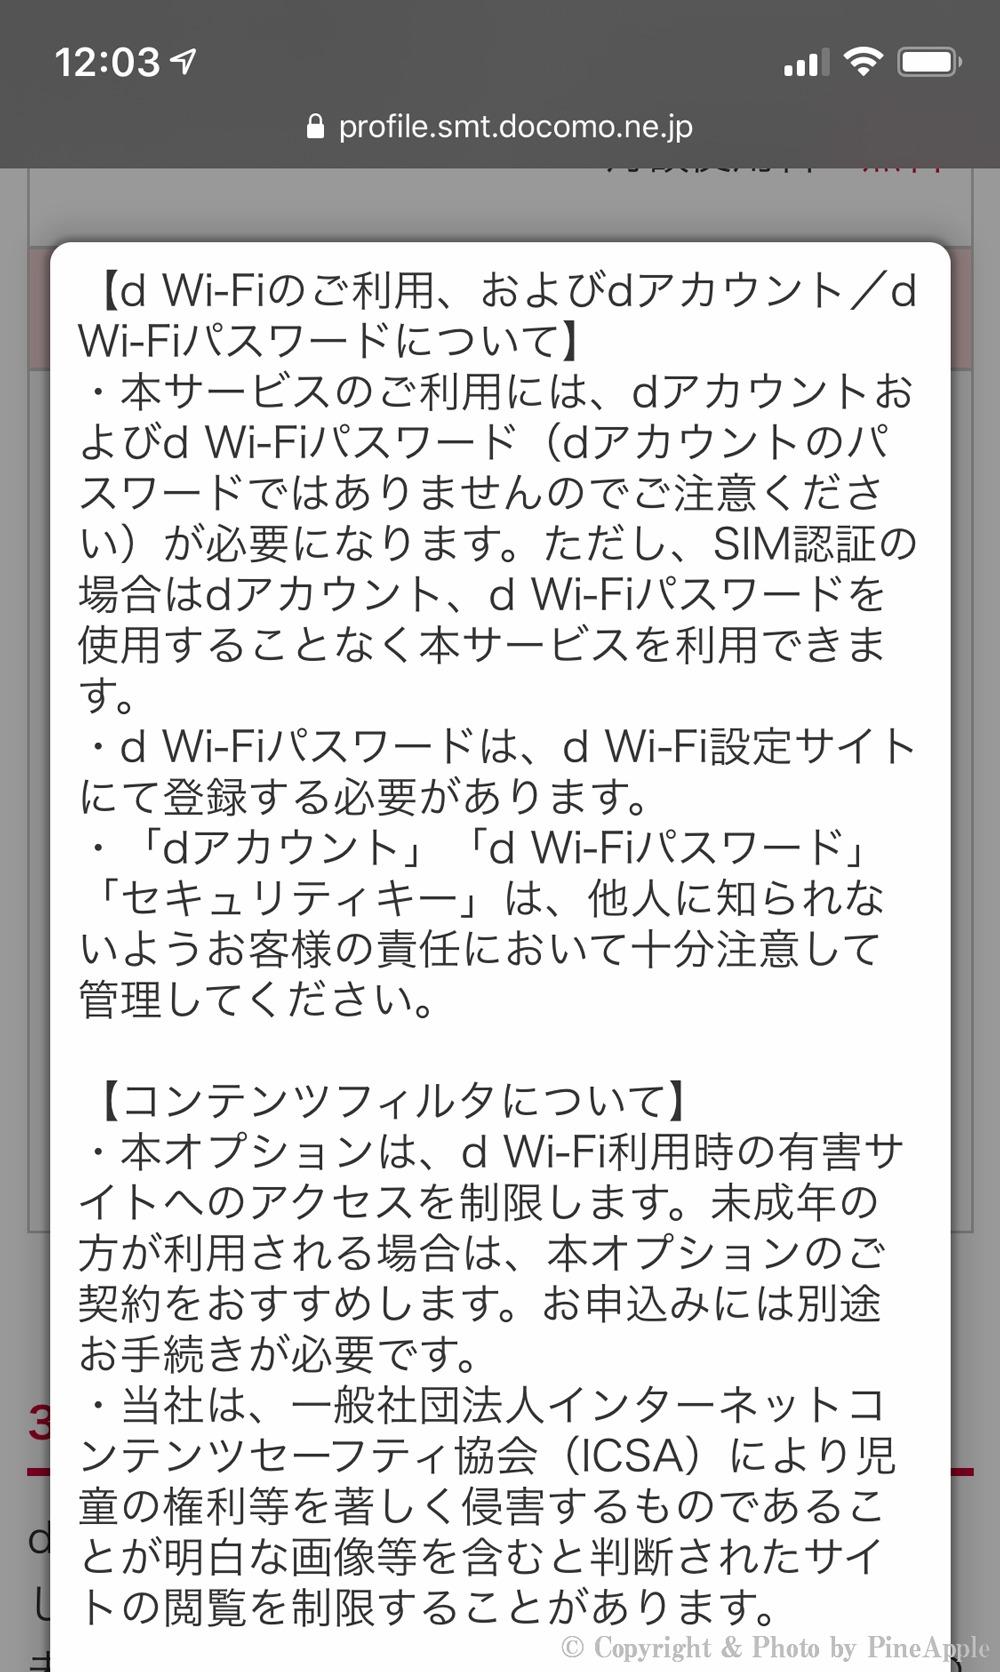 d Wi-Fi:「d Wi-Fi 注意事項・利用規約・パーソナルデータの取扱い」